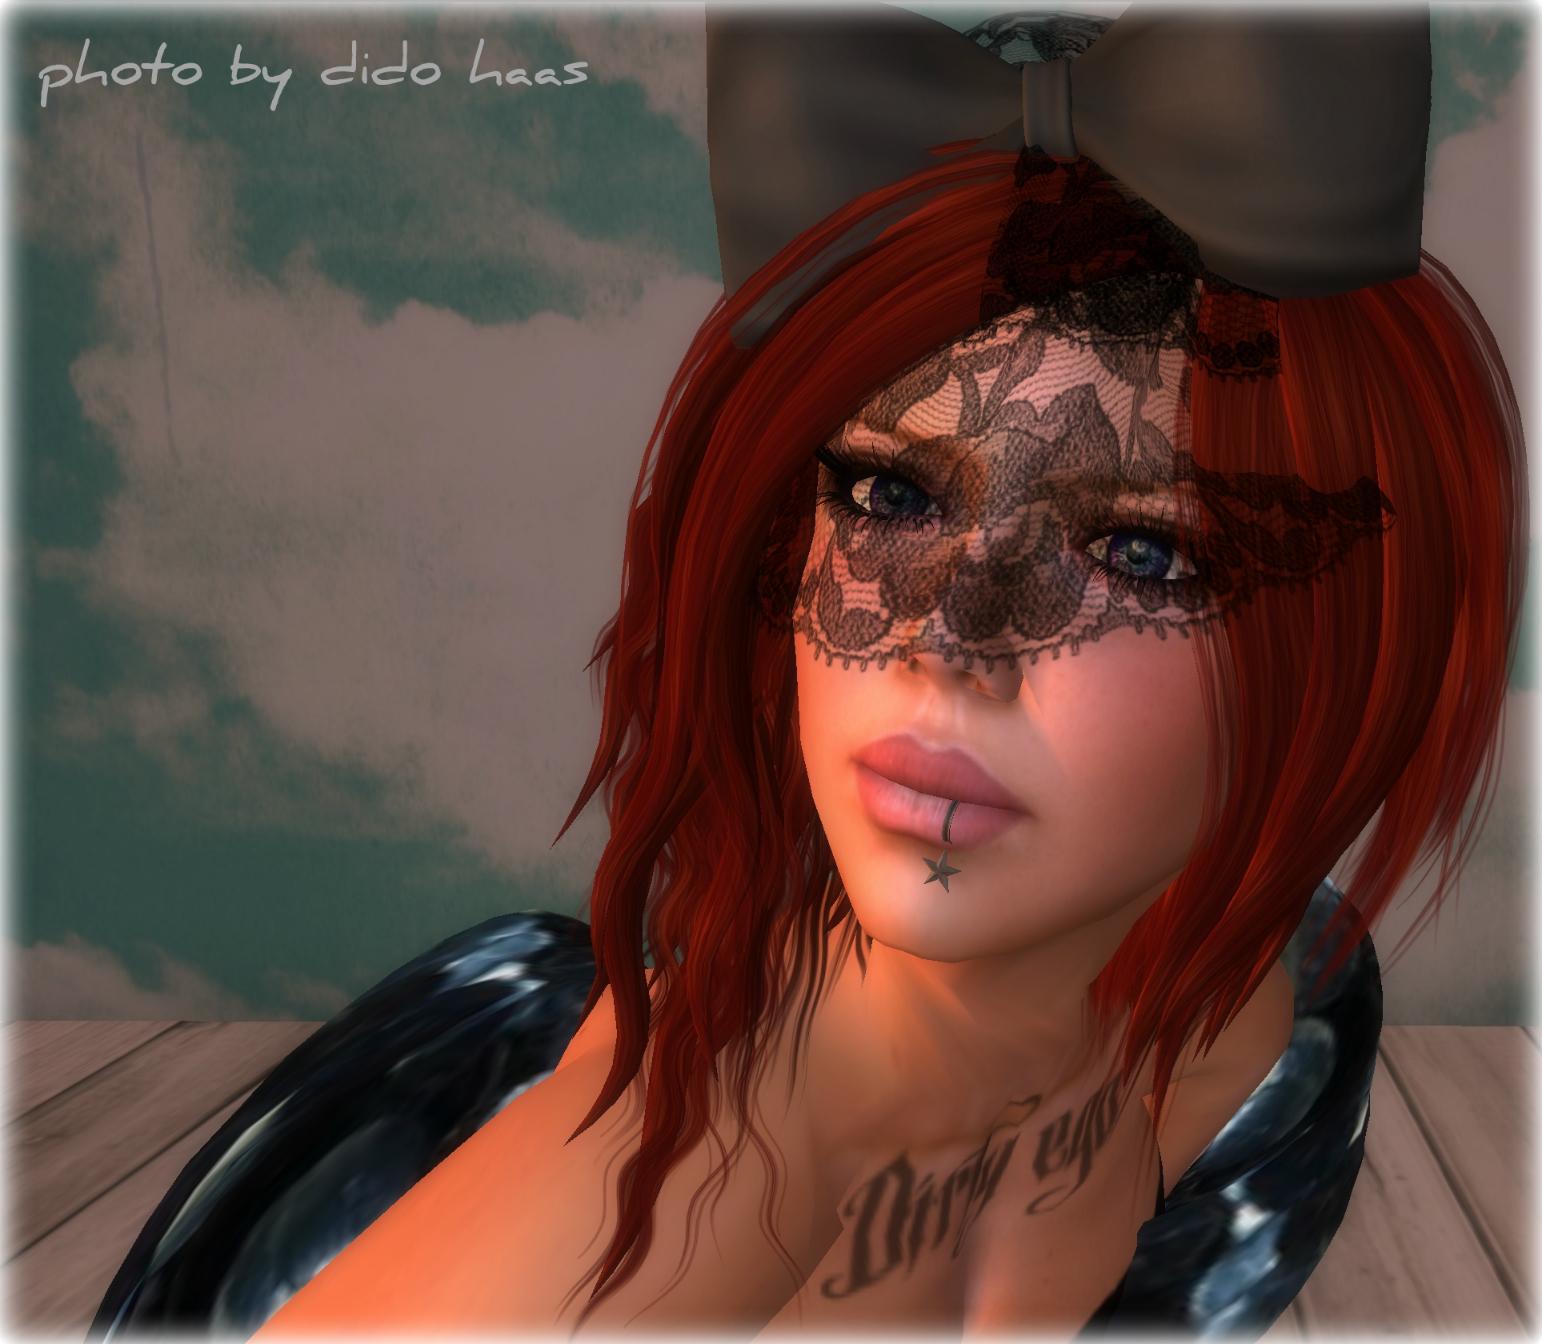 http://4.bp.blogspot.com/-KsxqEM_OaG8/TozrOGgQpcI/AAAAAAAAFWM/kN8_DT_ymCQ/s1600/dirty+ego+01.jpg